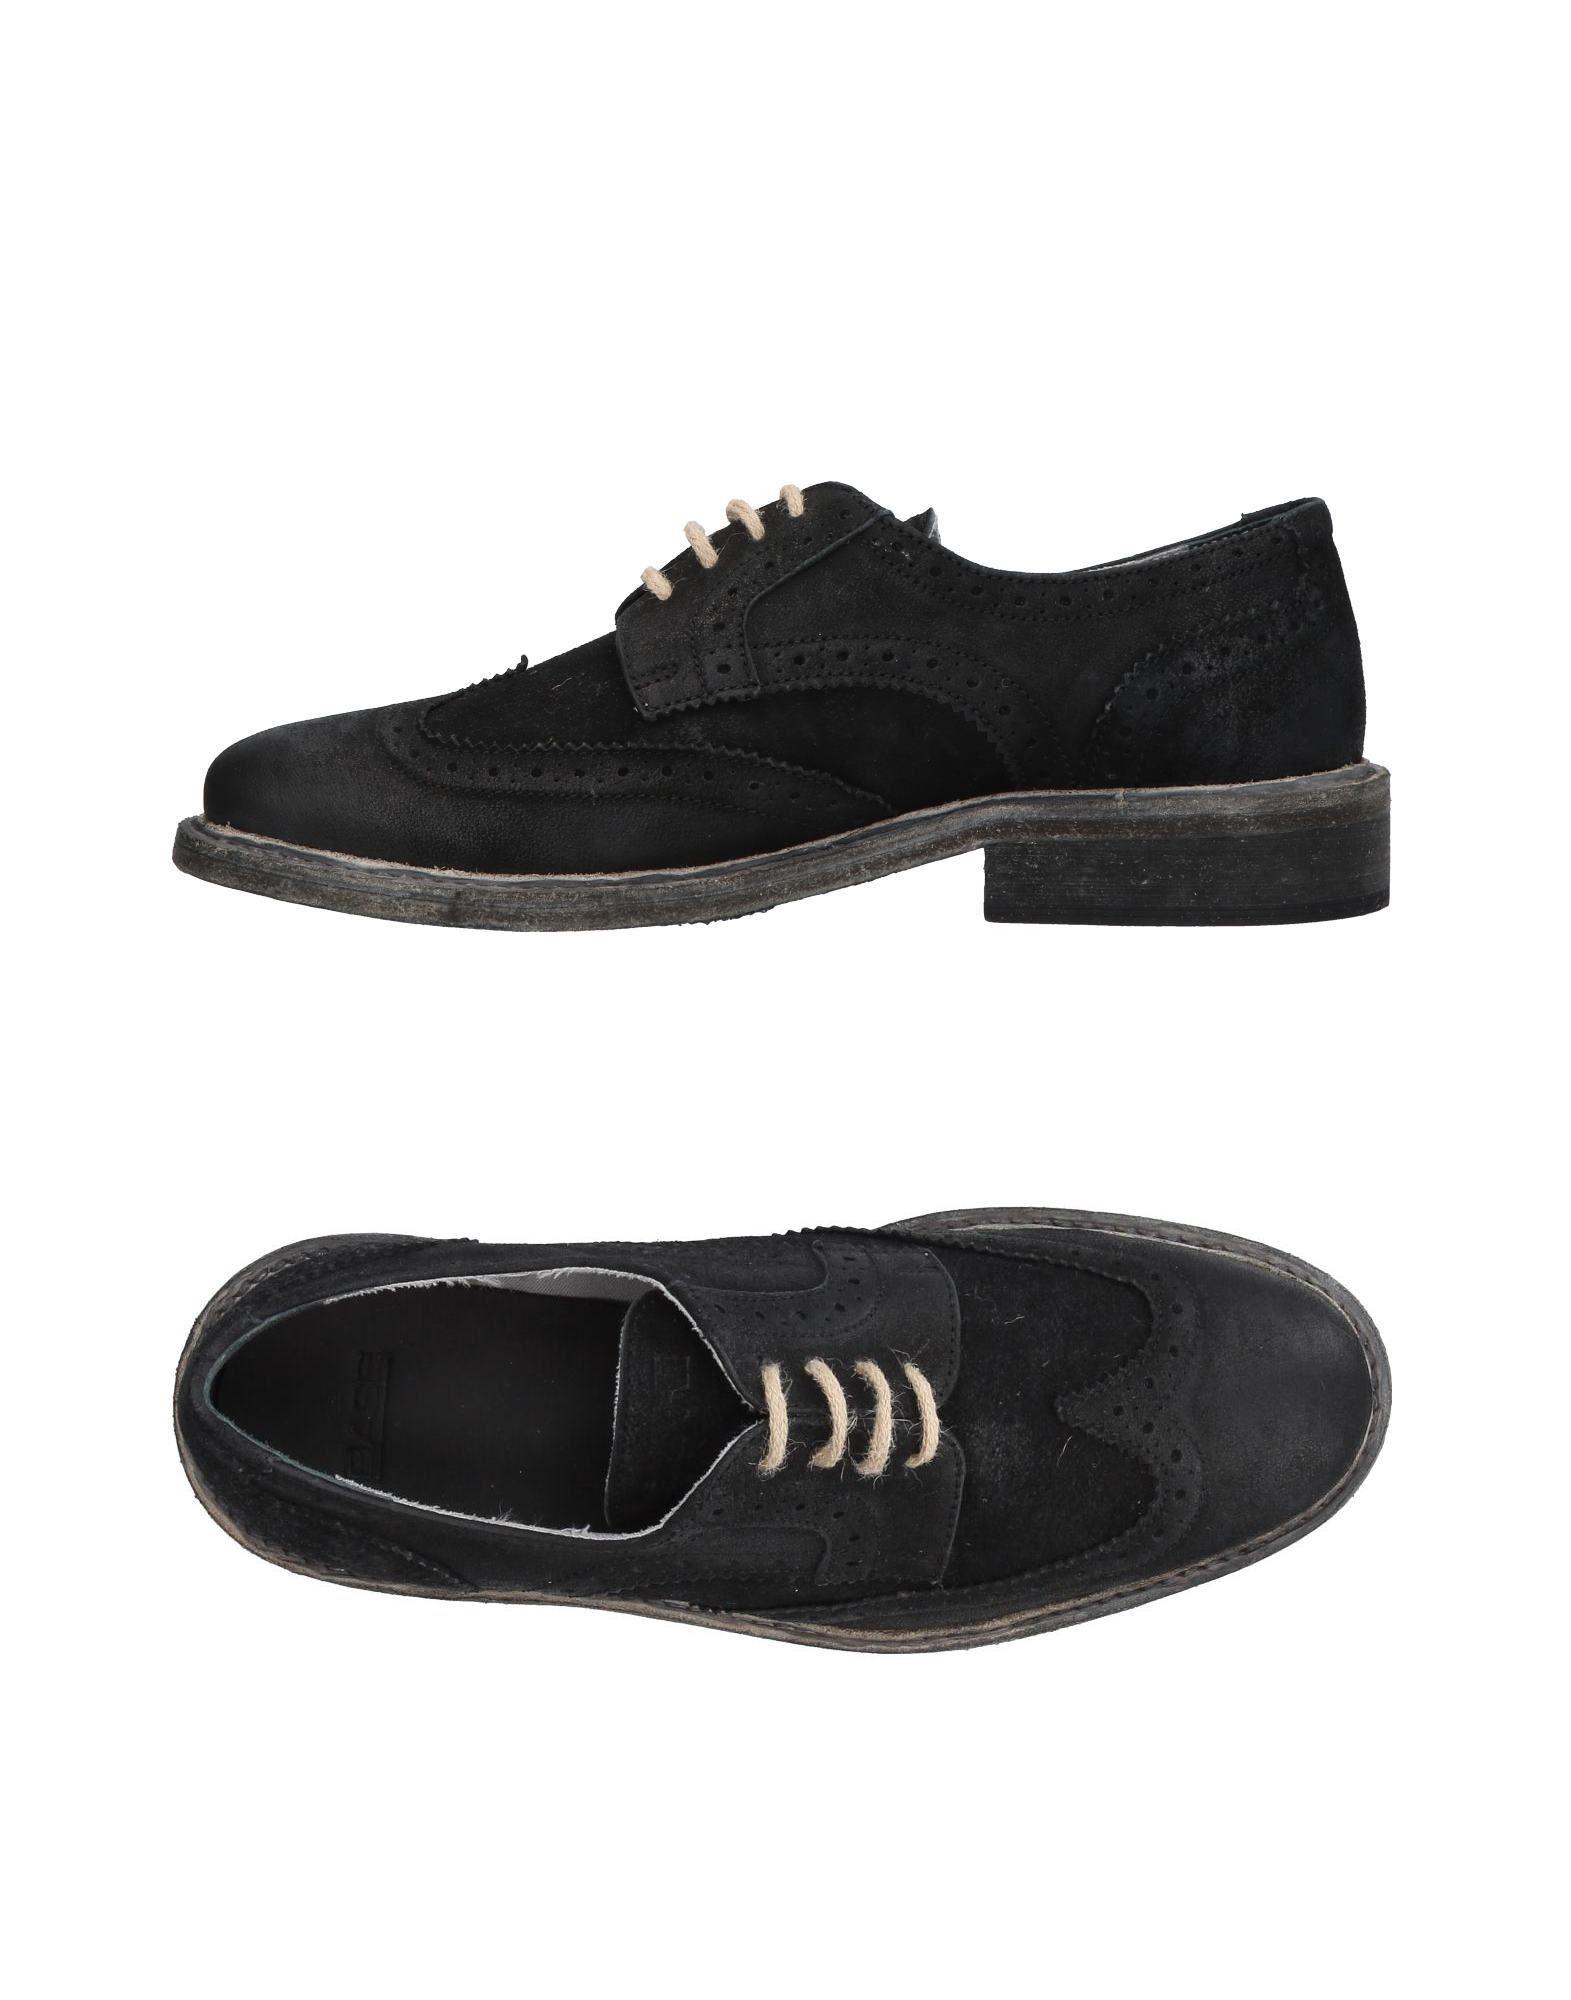 Rabatt echte Schuhe Base Schnürschuhe Herren  11381703VB